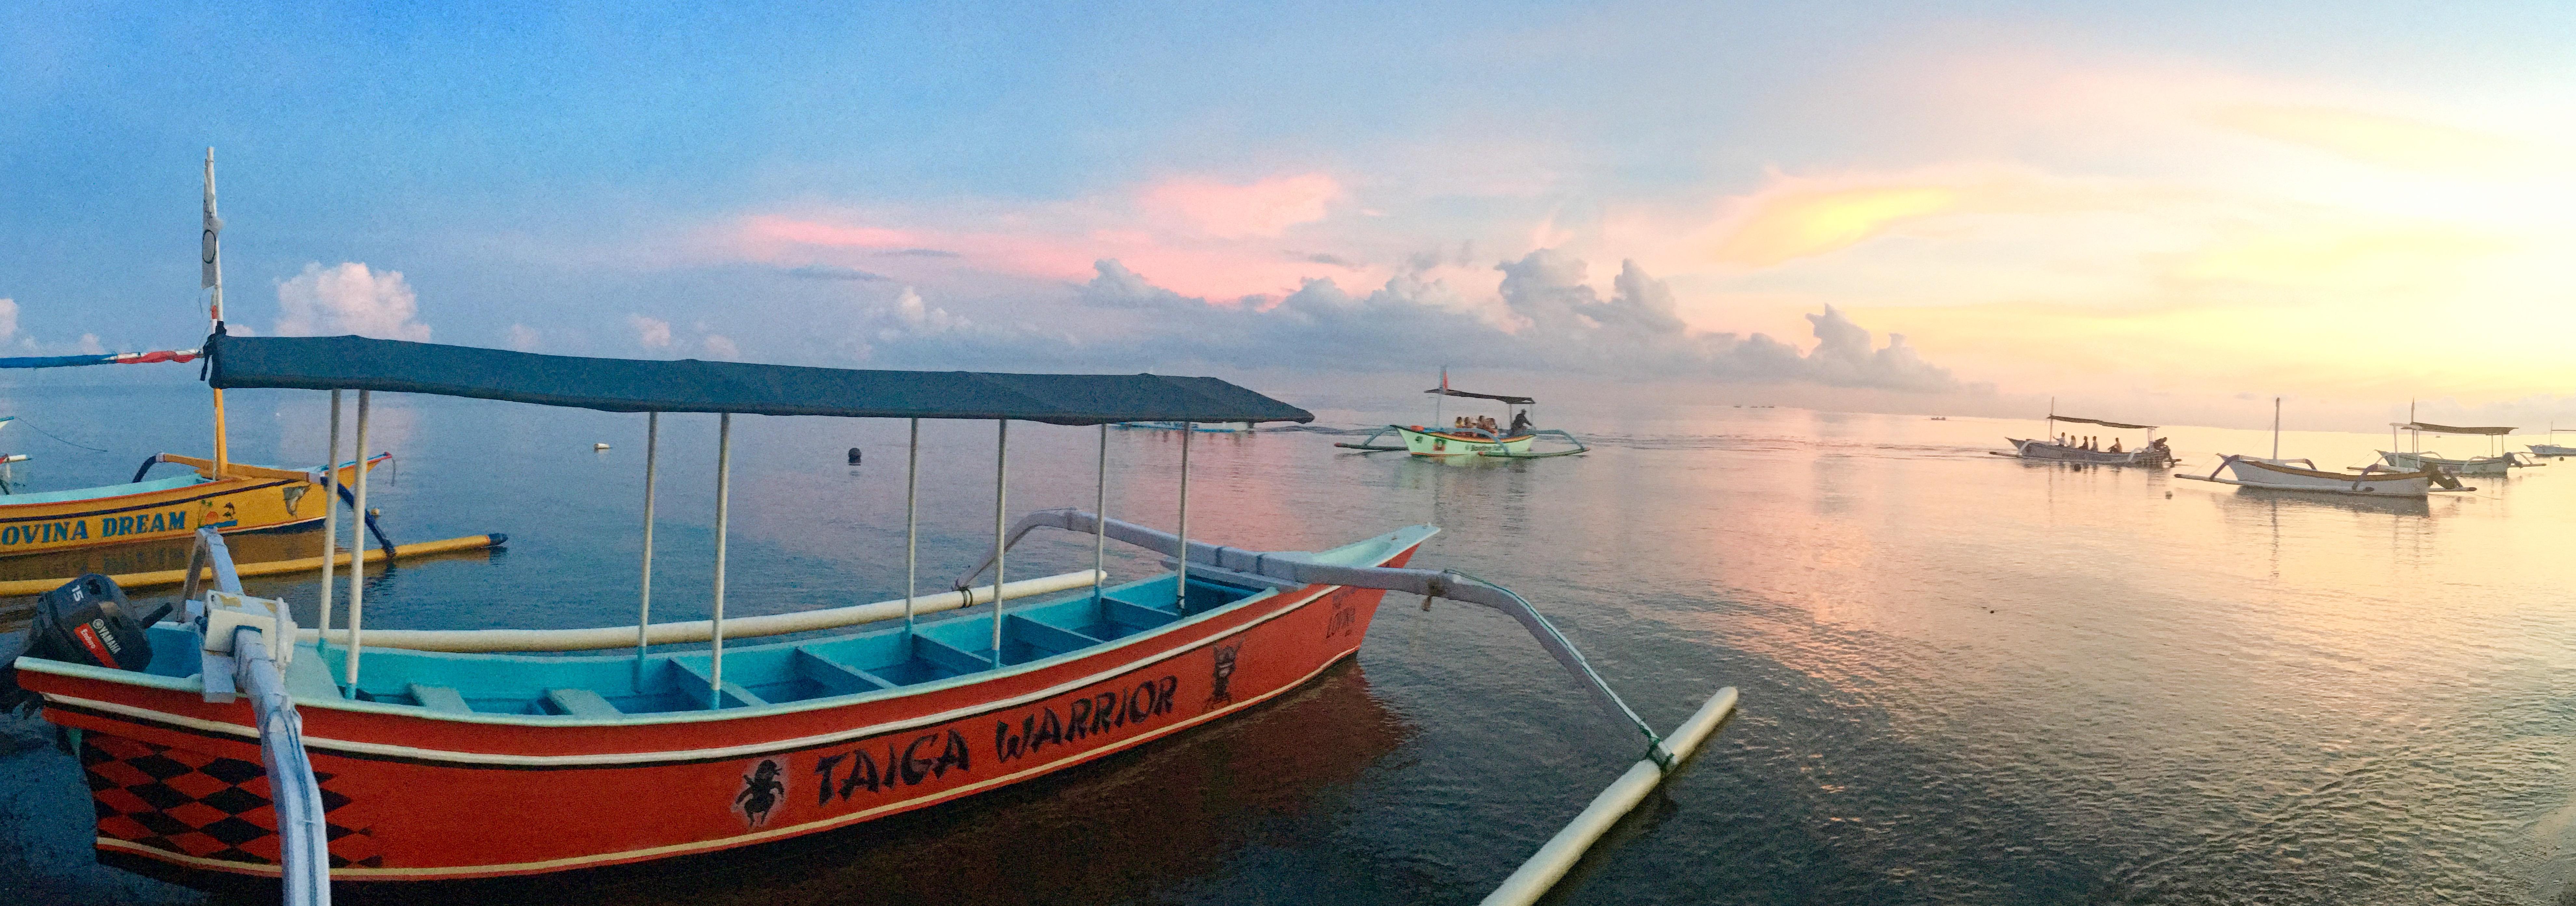 Lovina-1@Bali-2016-09-16